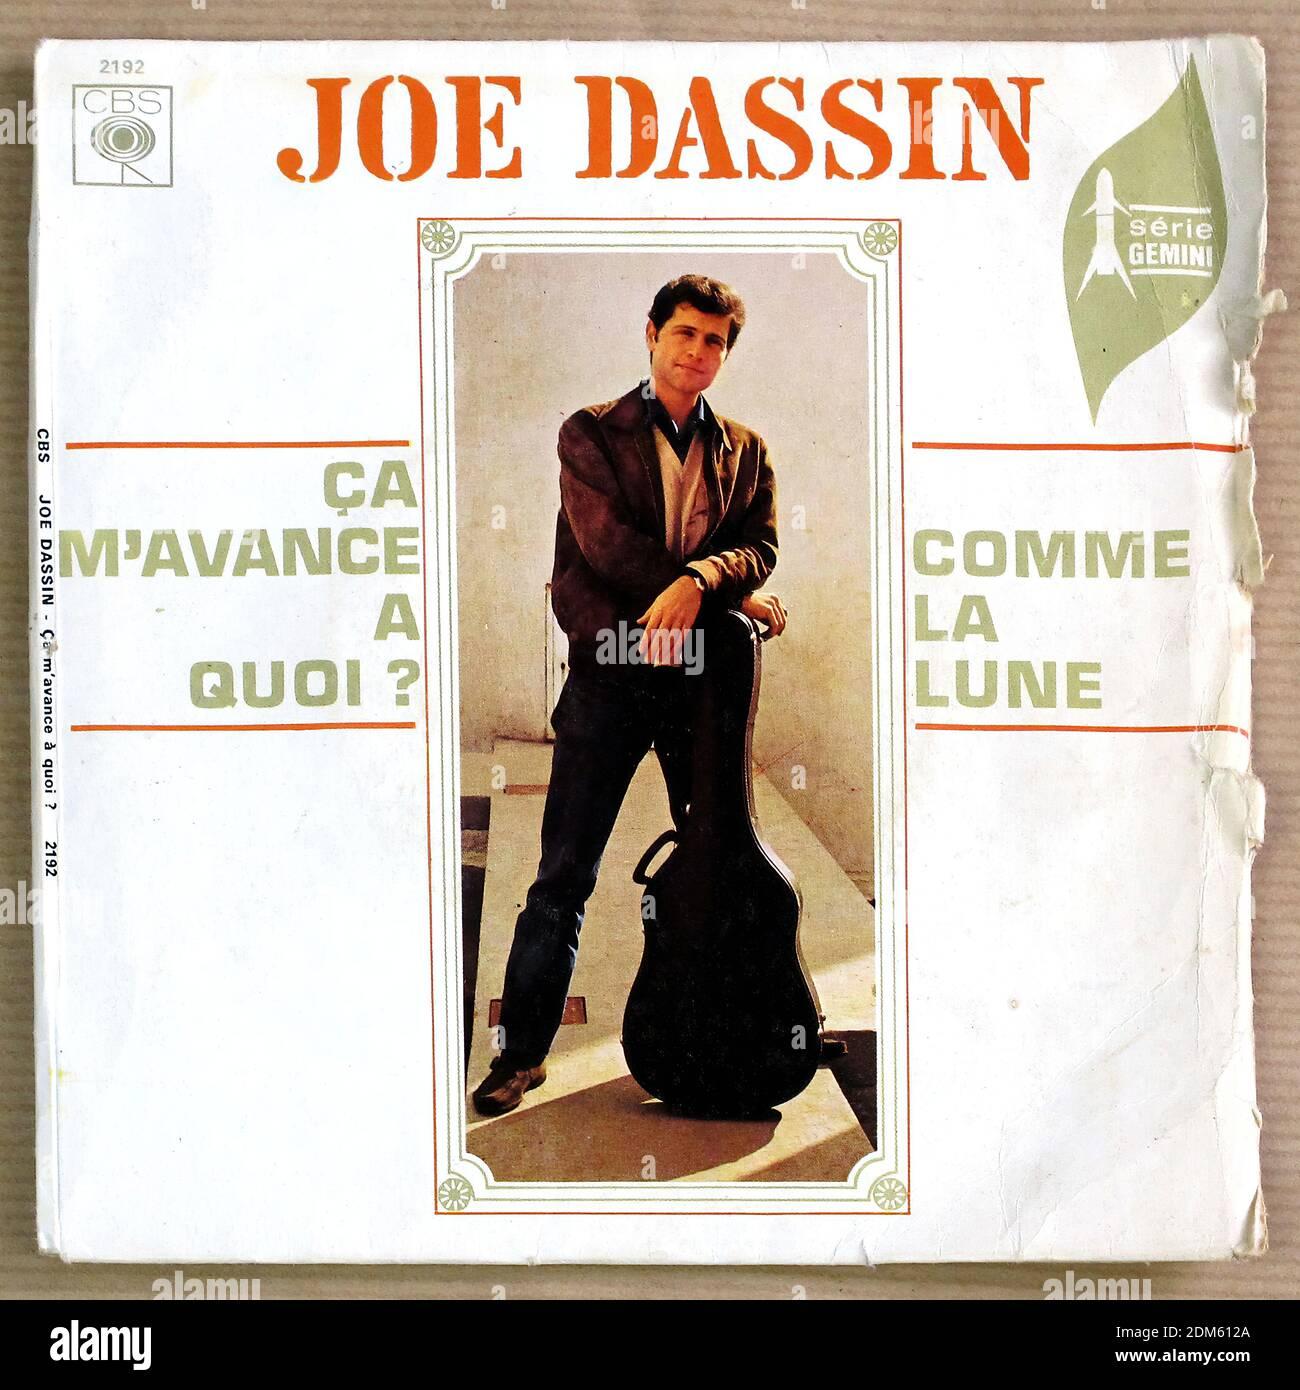 Joe Dassin Stock Photo Alamy